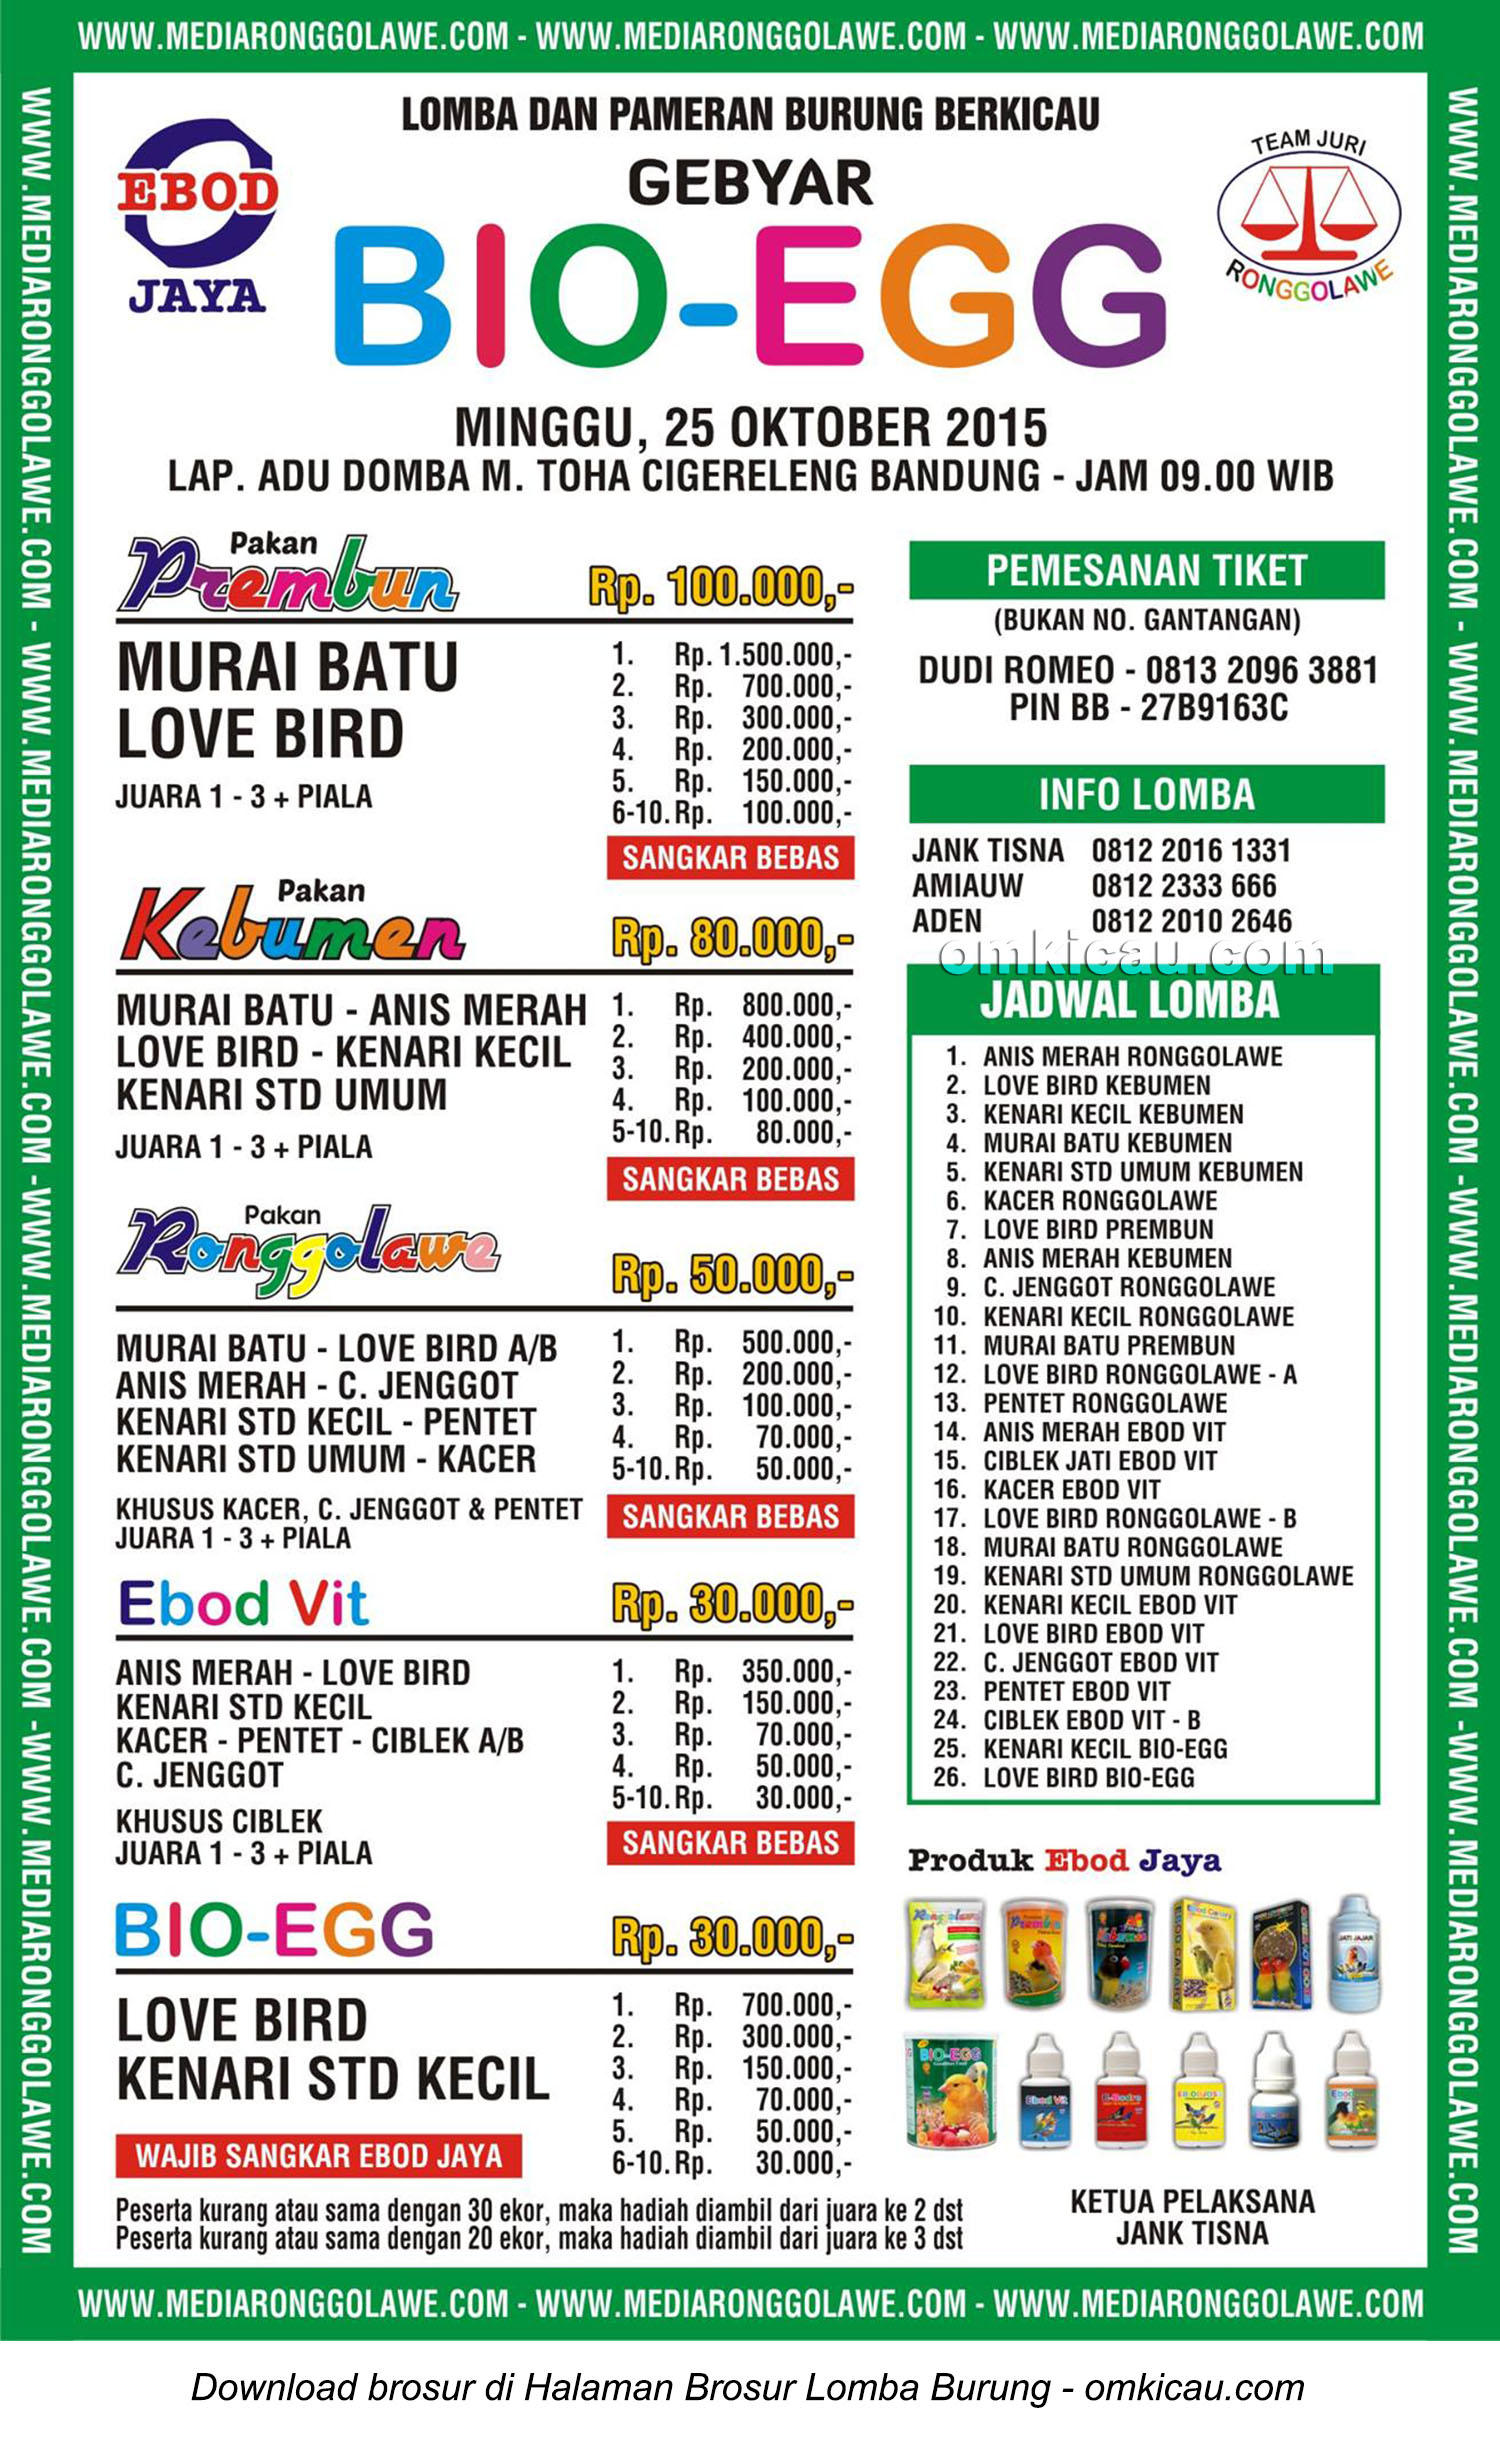 Brosur Lomba Burung Berkicau Gebyar Bio-Egg, Bandung, 25 Oktober 2015